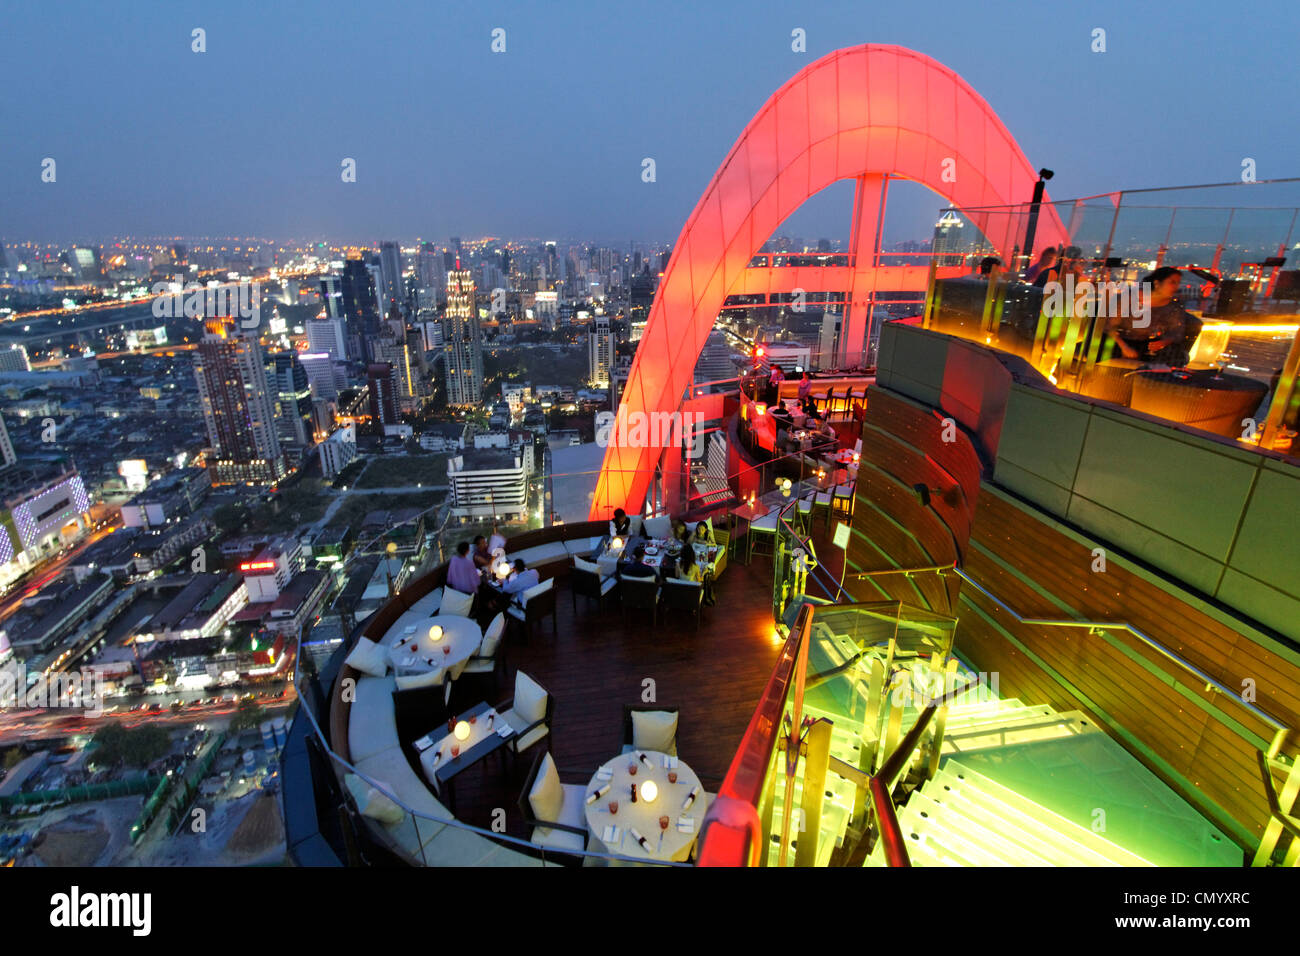 Red Sky Bar, 55th flour, Centara Grand Hotel, Central World, Bangkok, Thailand - Stock Image